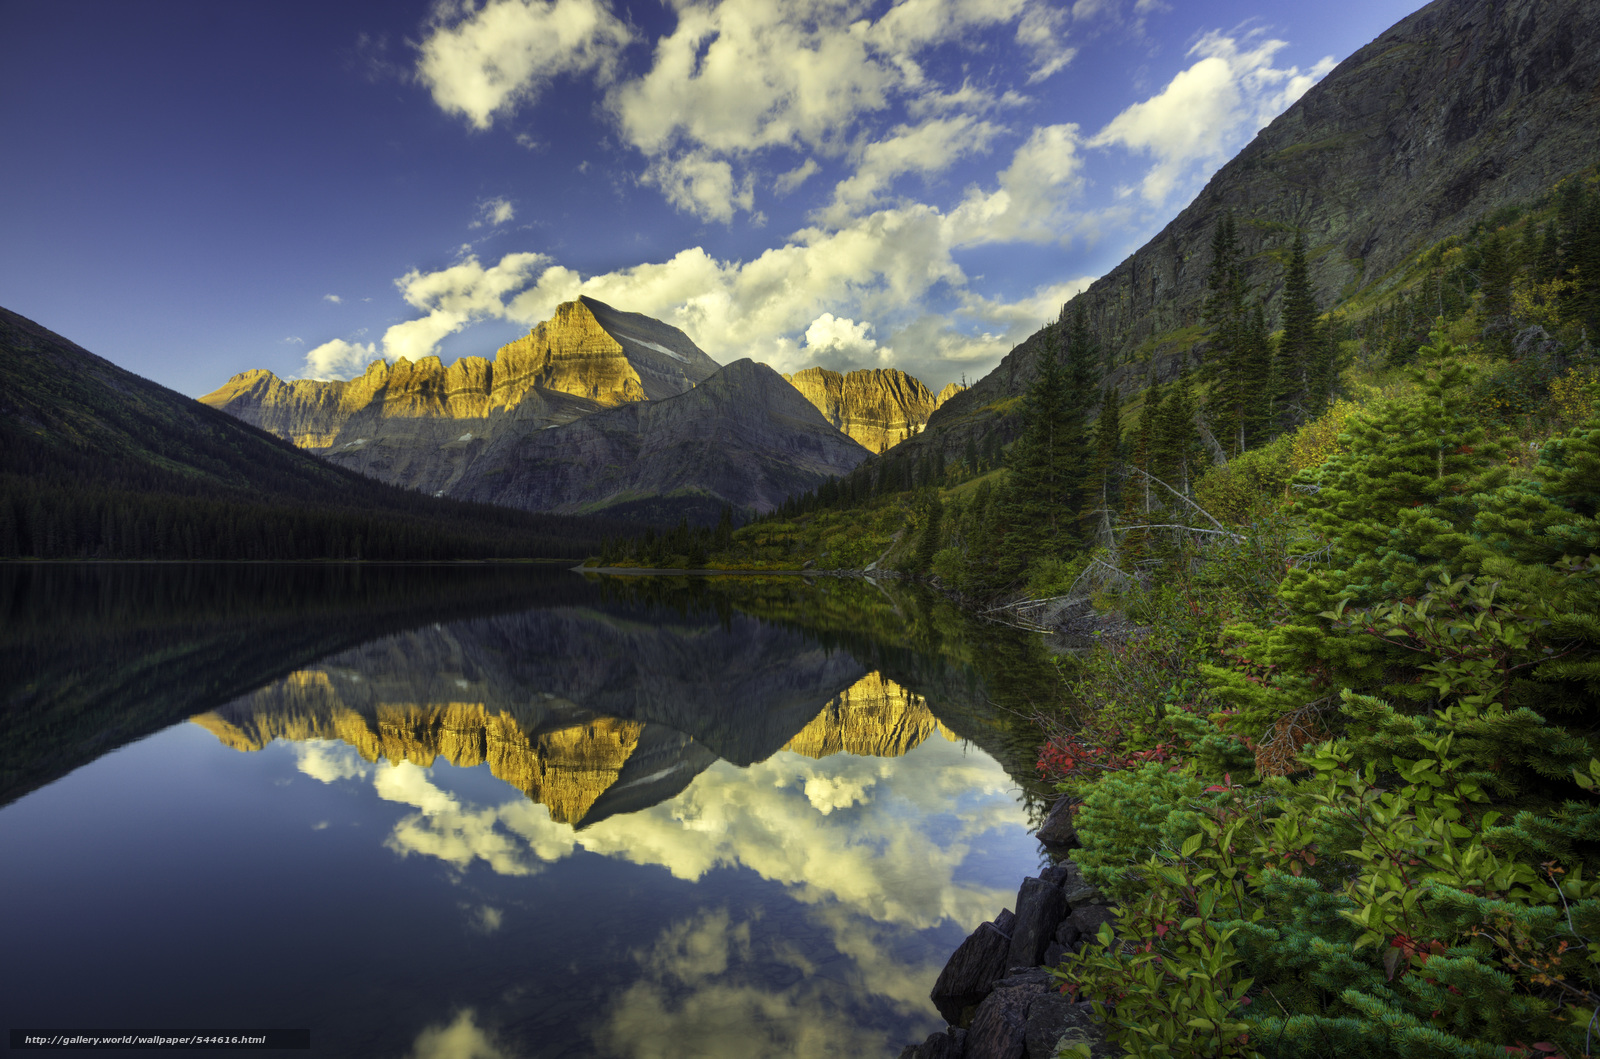 Download wallpaper Glacier National Park lake Mountains landscape 1600x1059